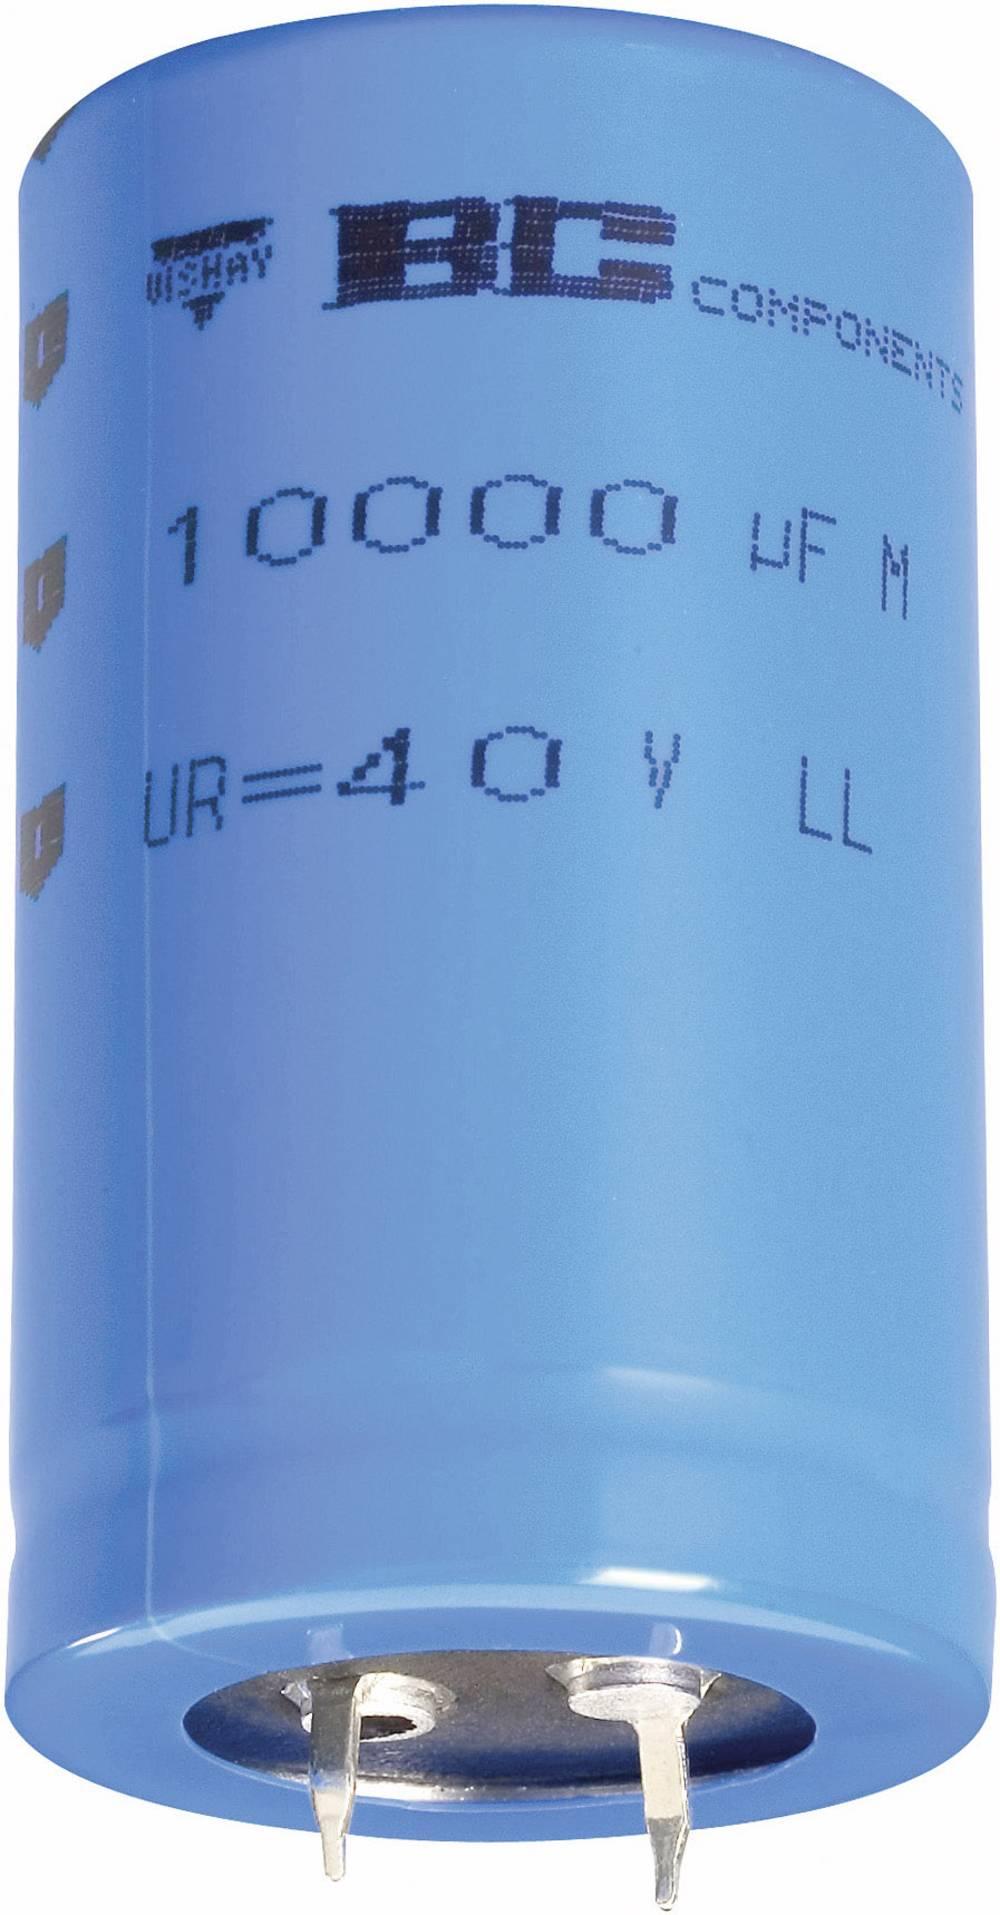 Snažan elektrolitski kondenzator SNAP IN 105 4700u63V Vishay 2222 058 58332